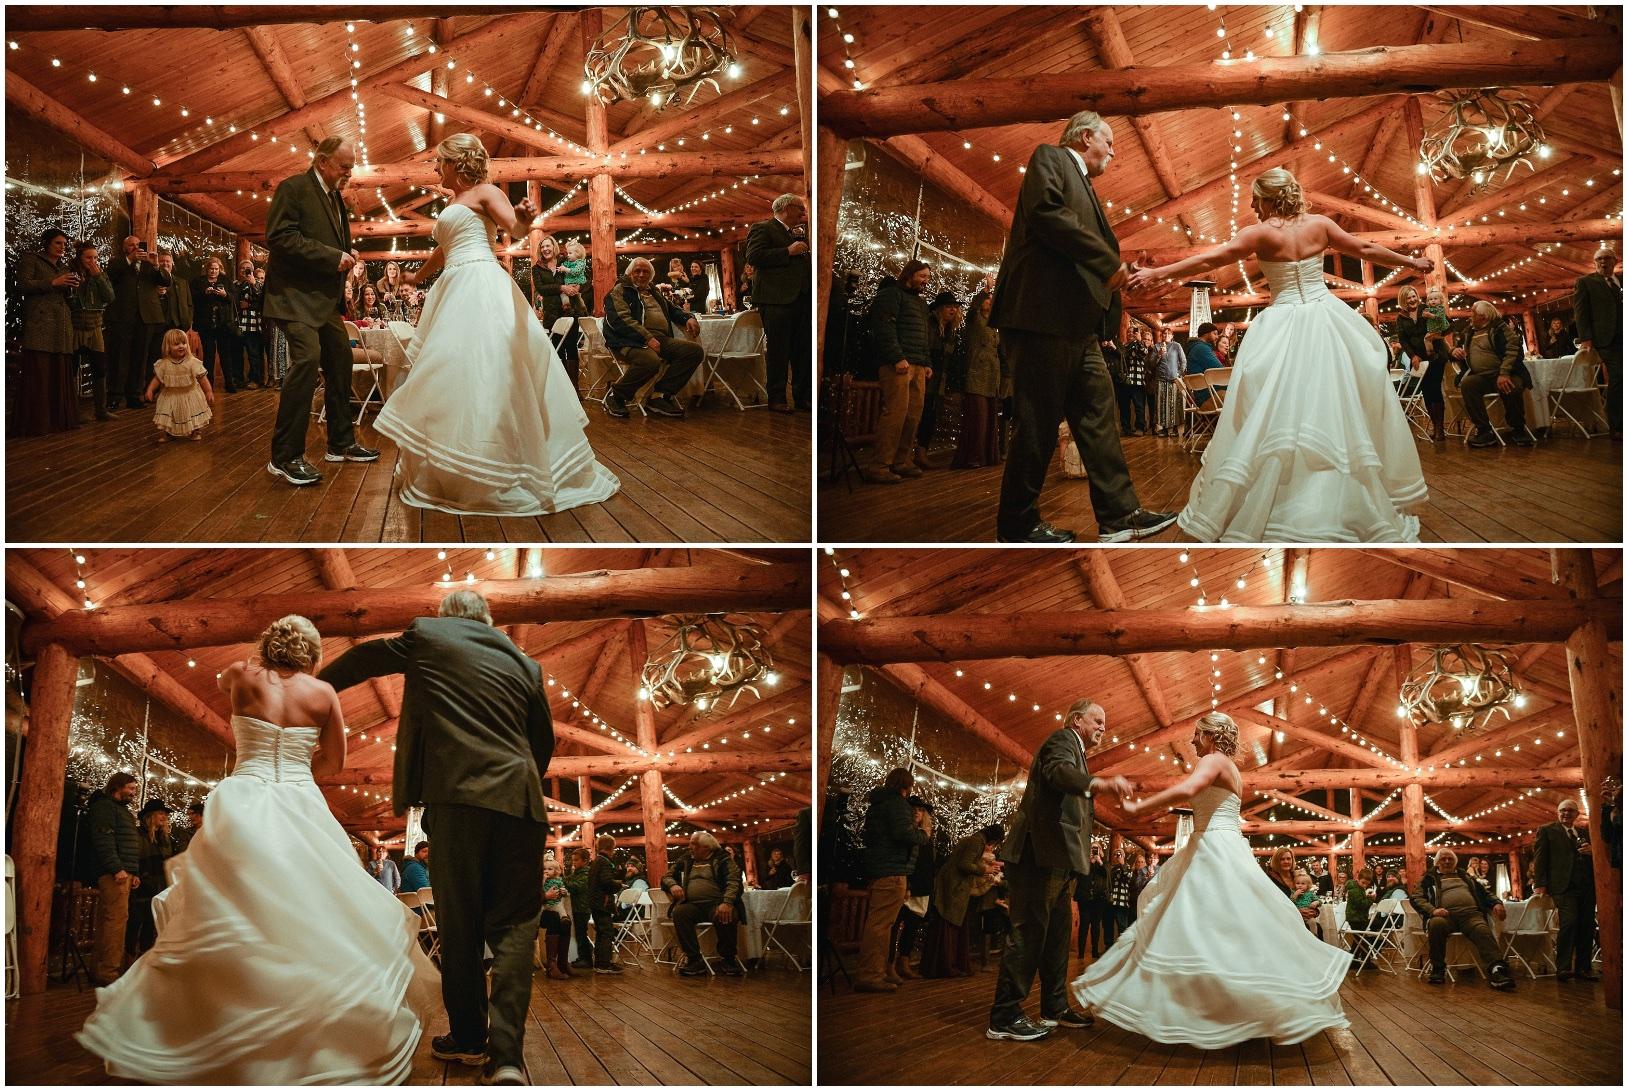 lindseyjane_wedding099.jpg